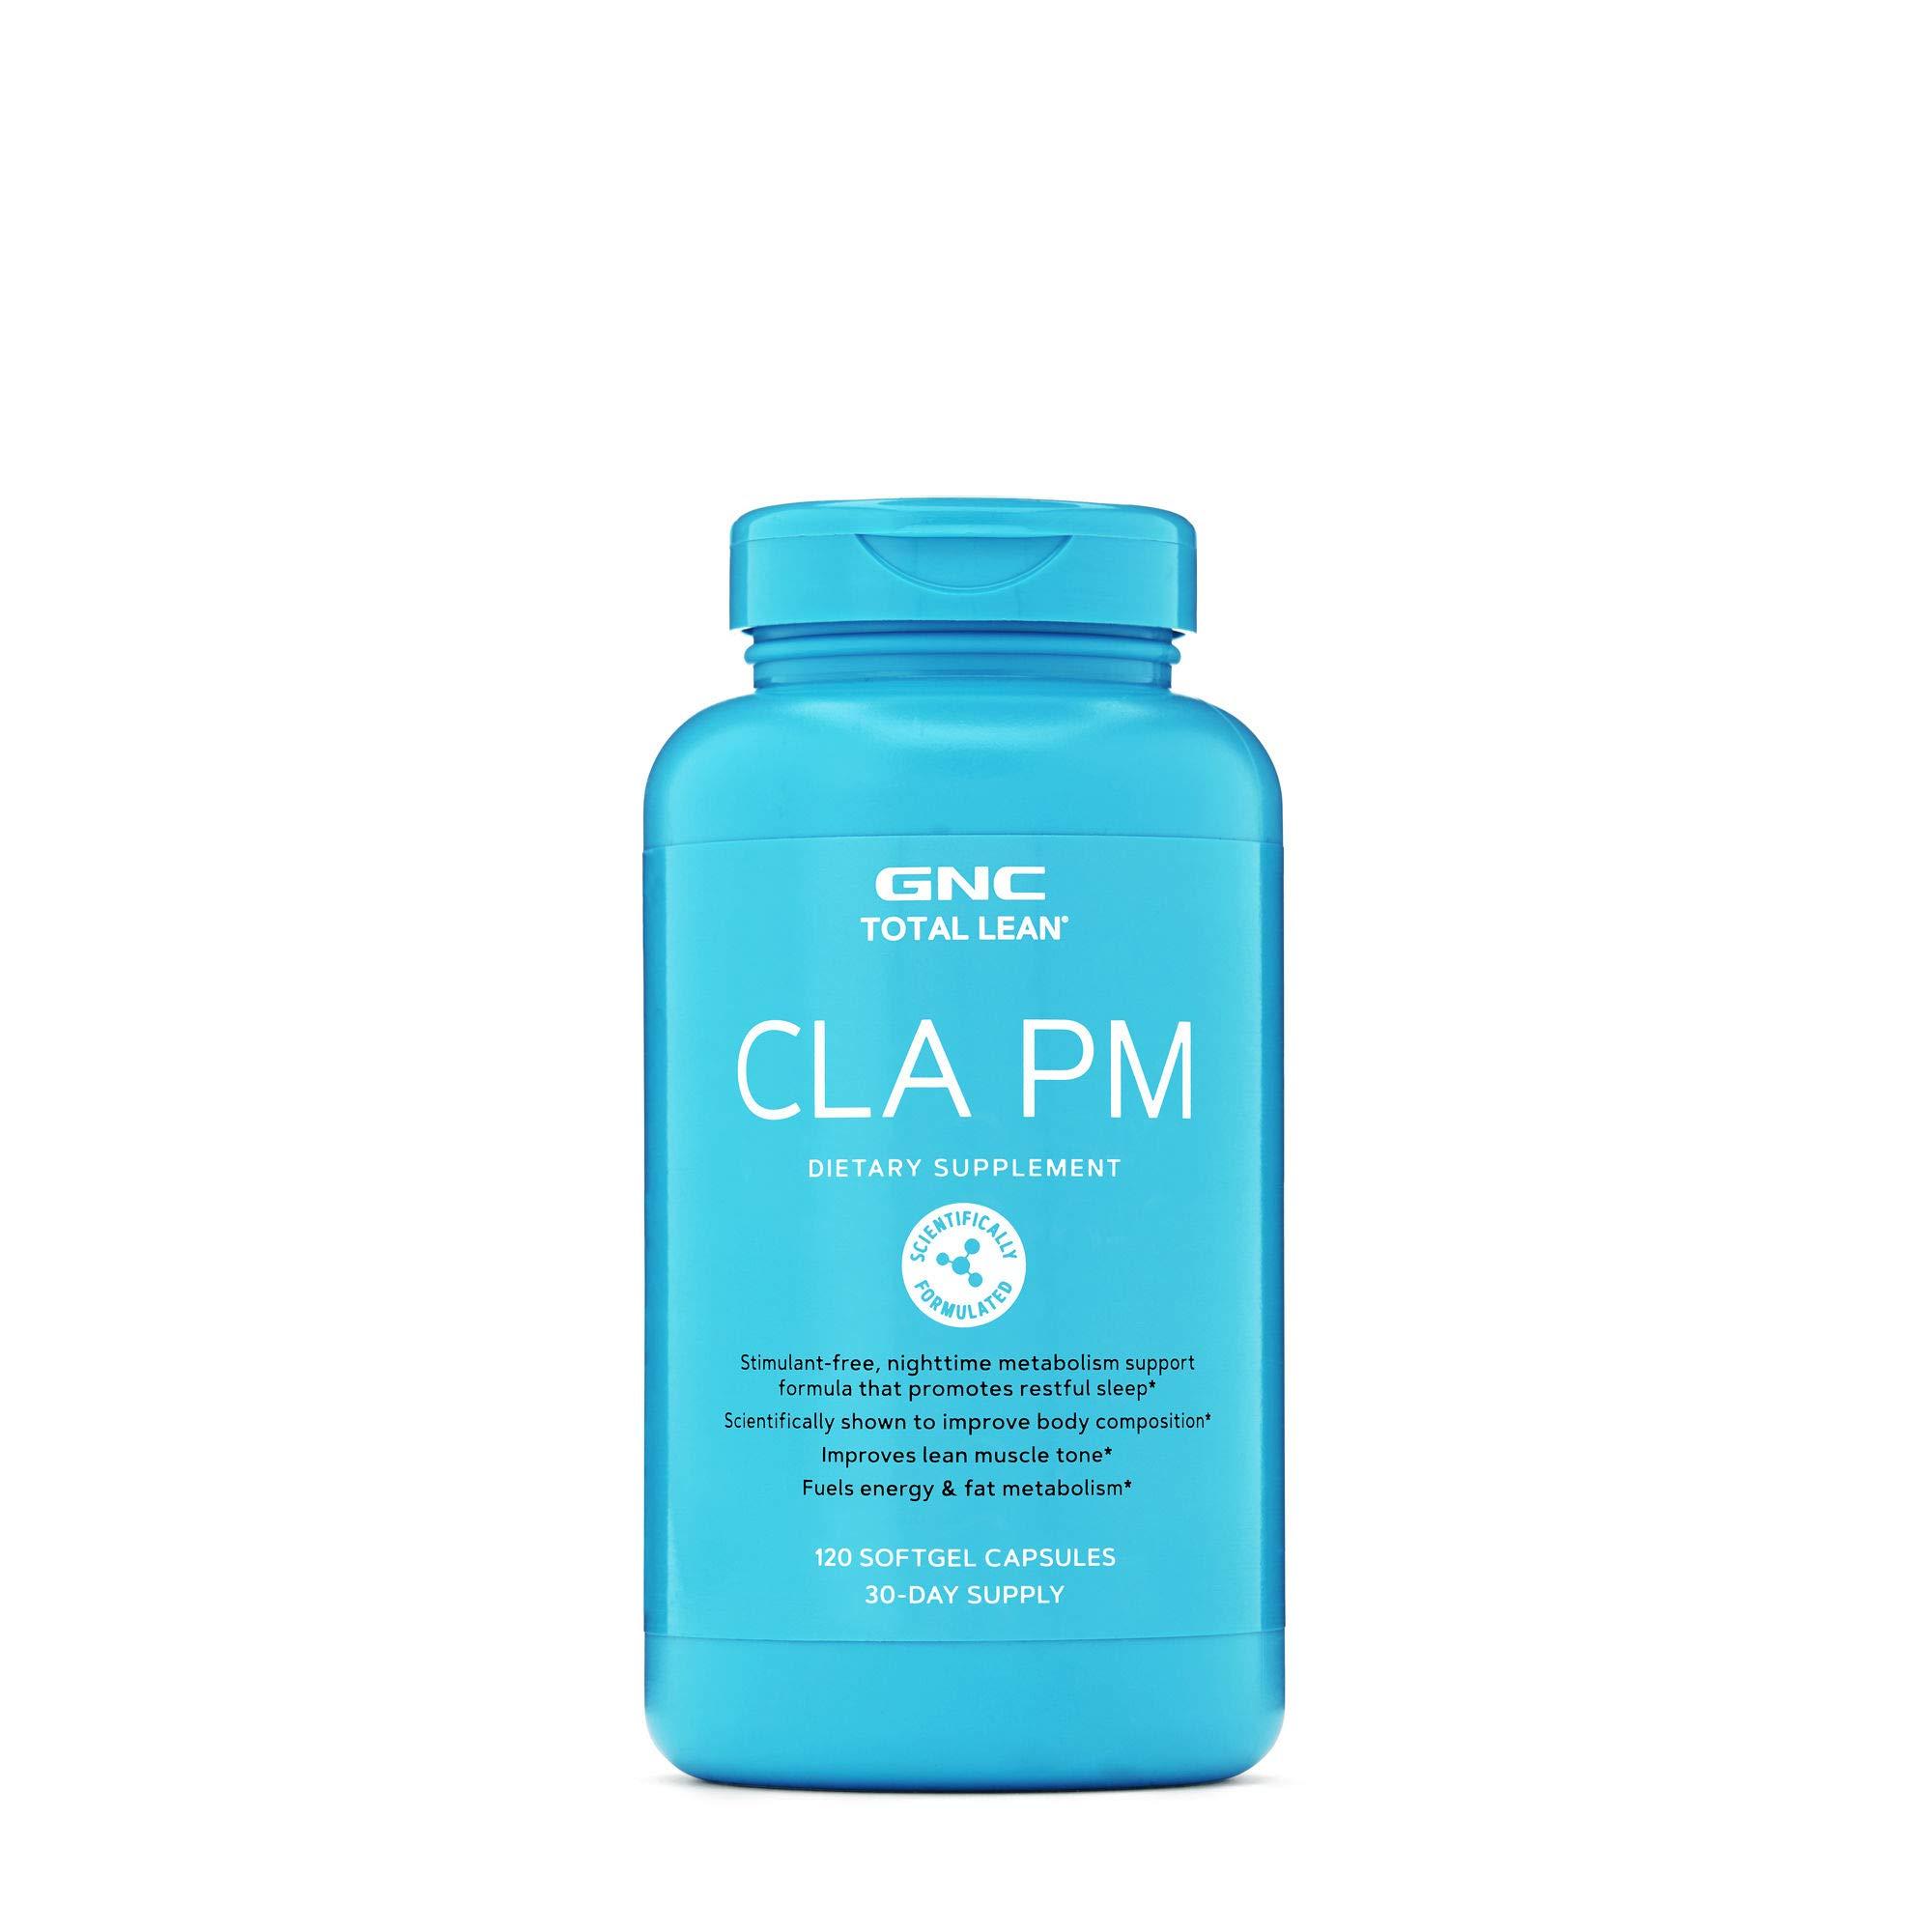 GNC Total Lean CLA PM by GNC